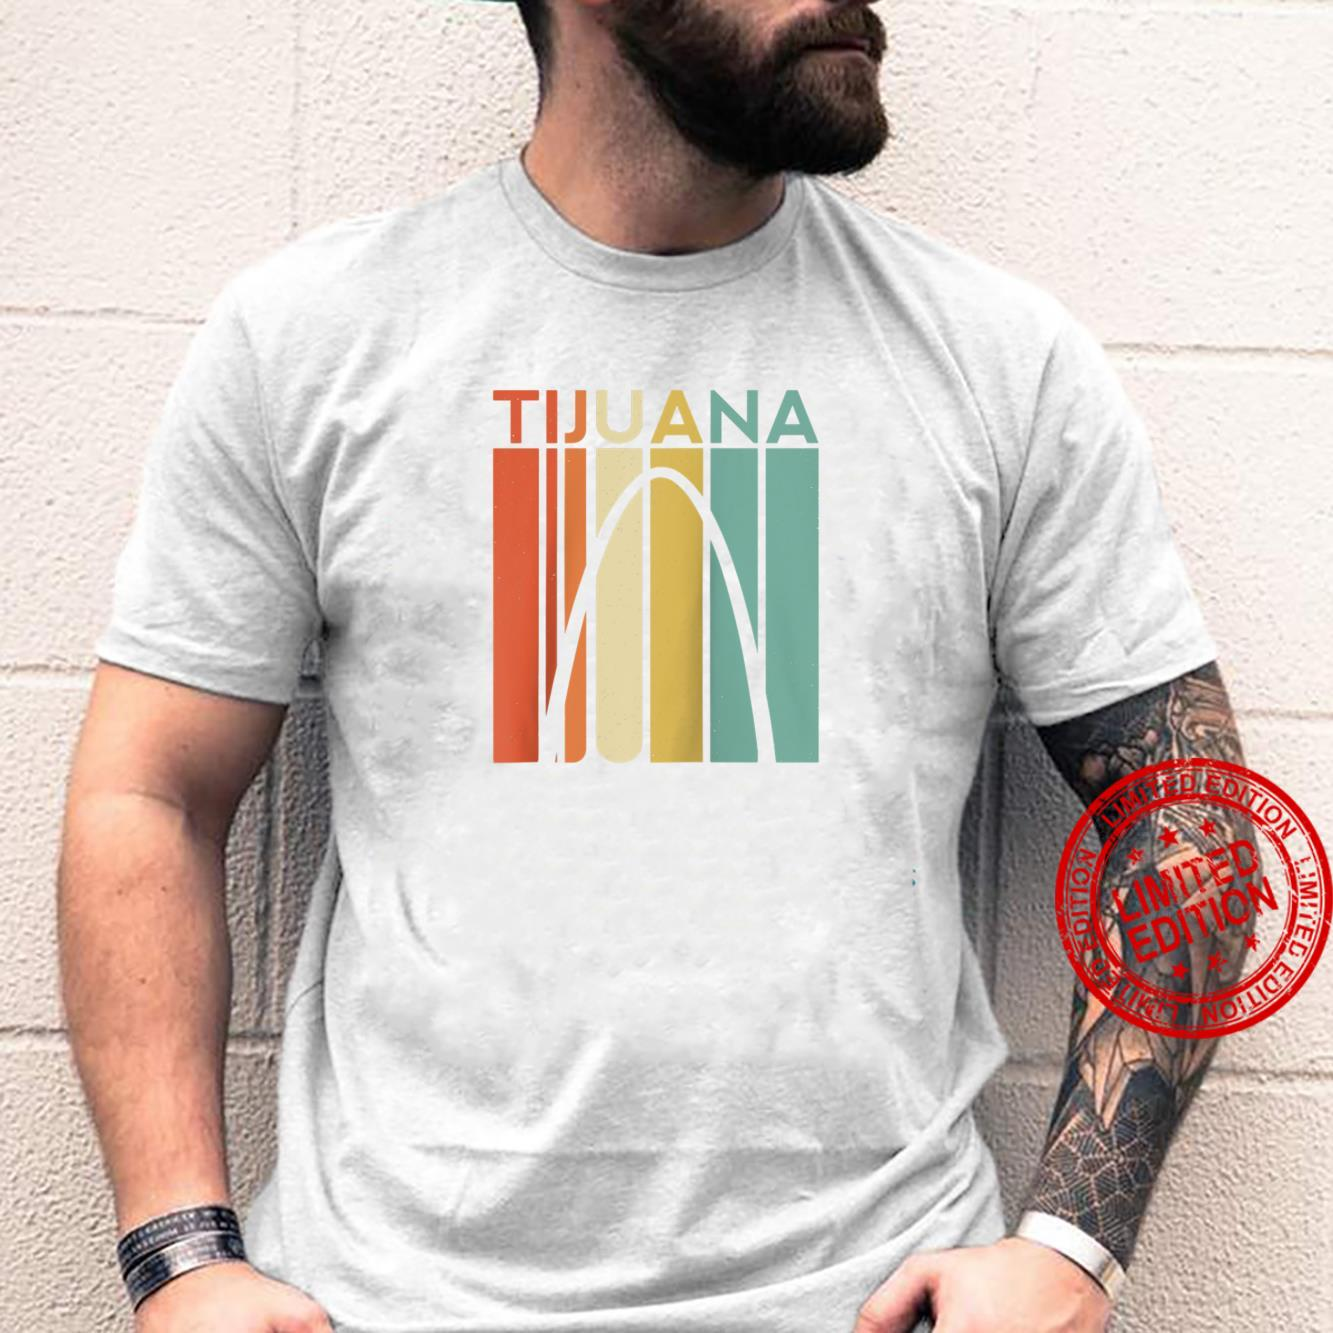 Tijuana Retro Vintage Great Again Mexico Mexican TJ Border Shirt